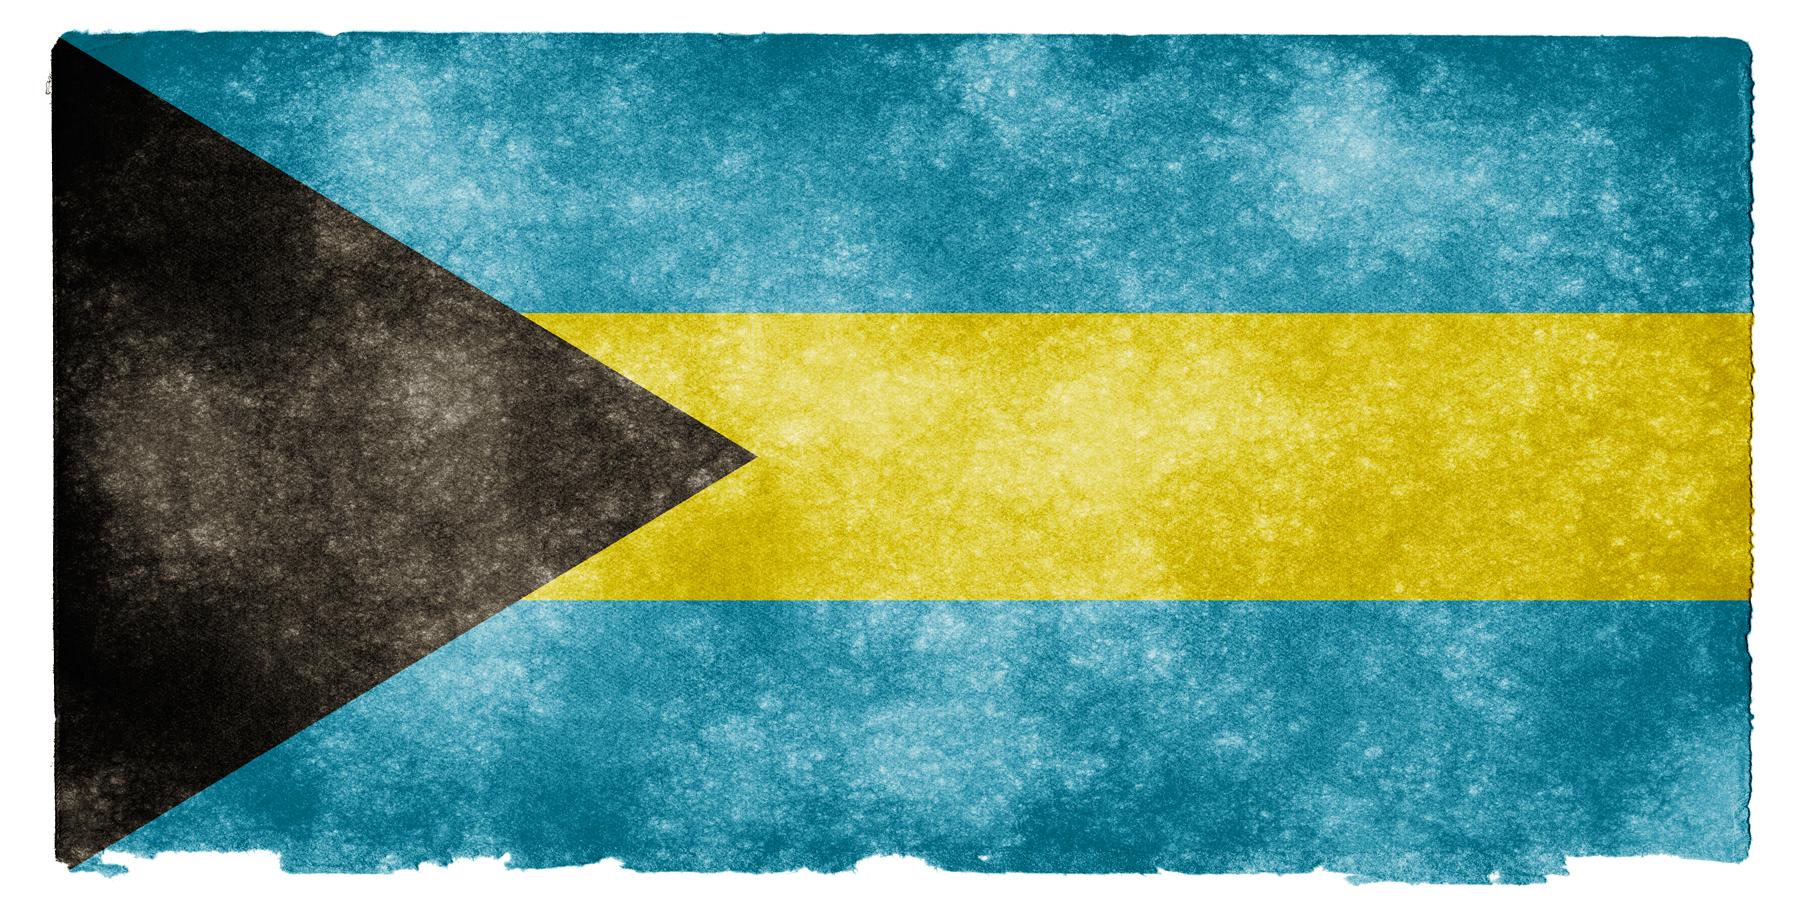 Bahamas Grunge Flag HD Wallpaper